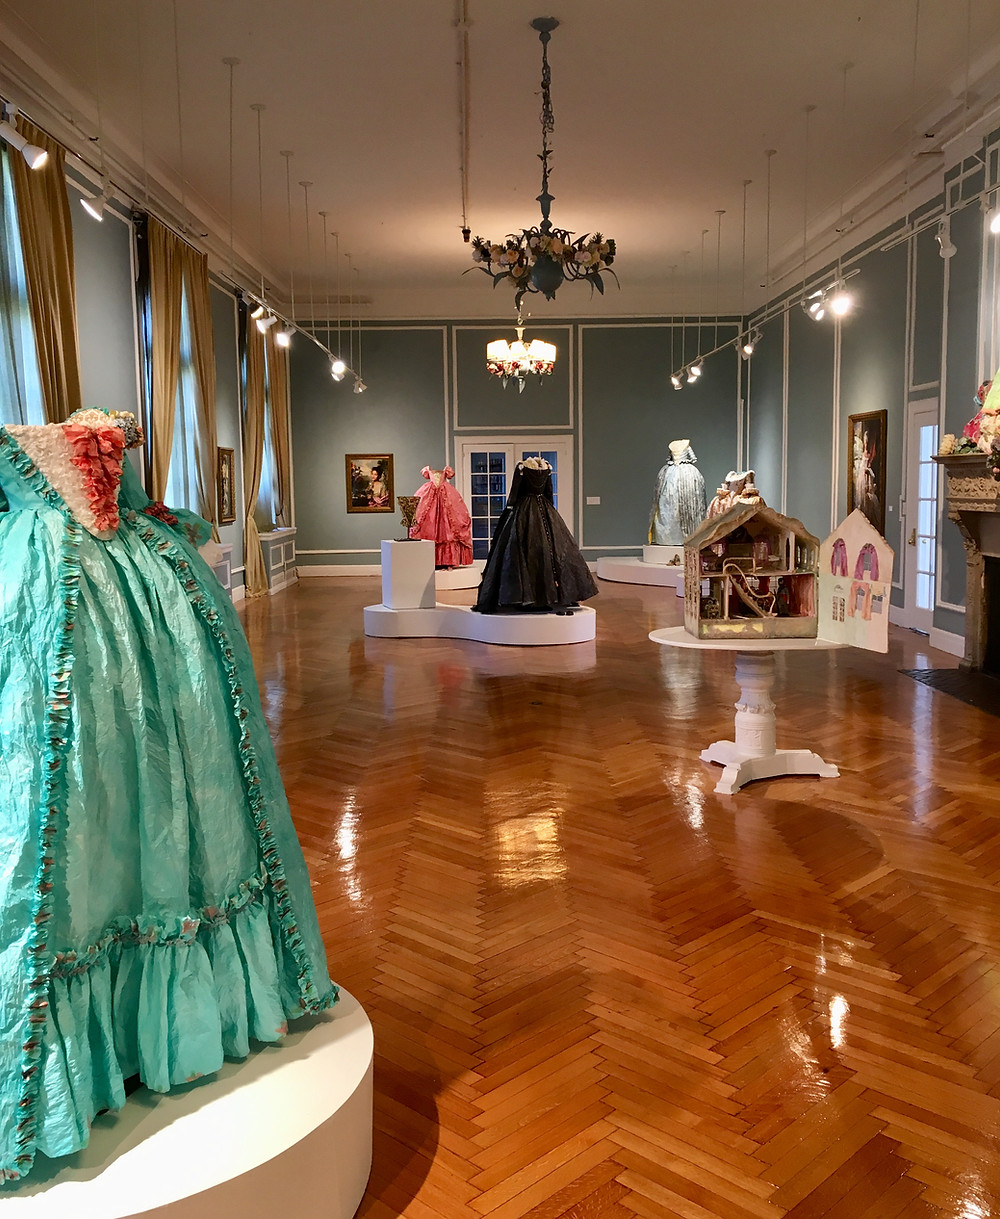 Artist Fabiola Jean-Louis reimagines the past through portraits of black women in baroque gowns